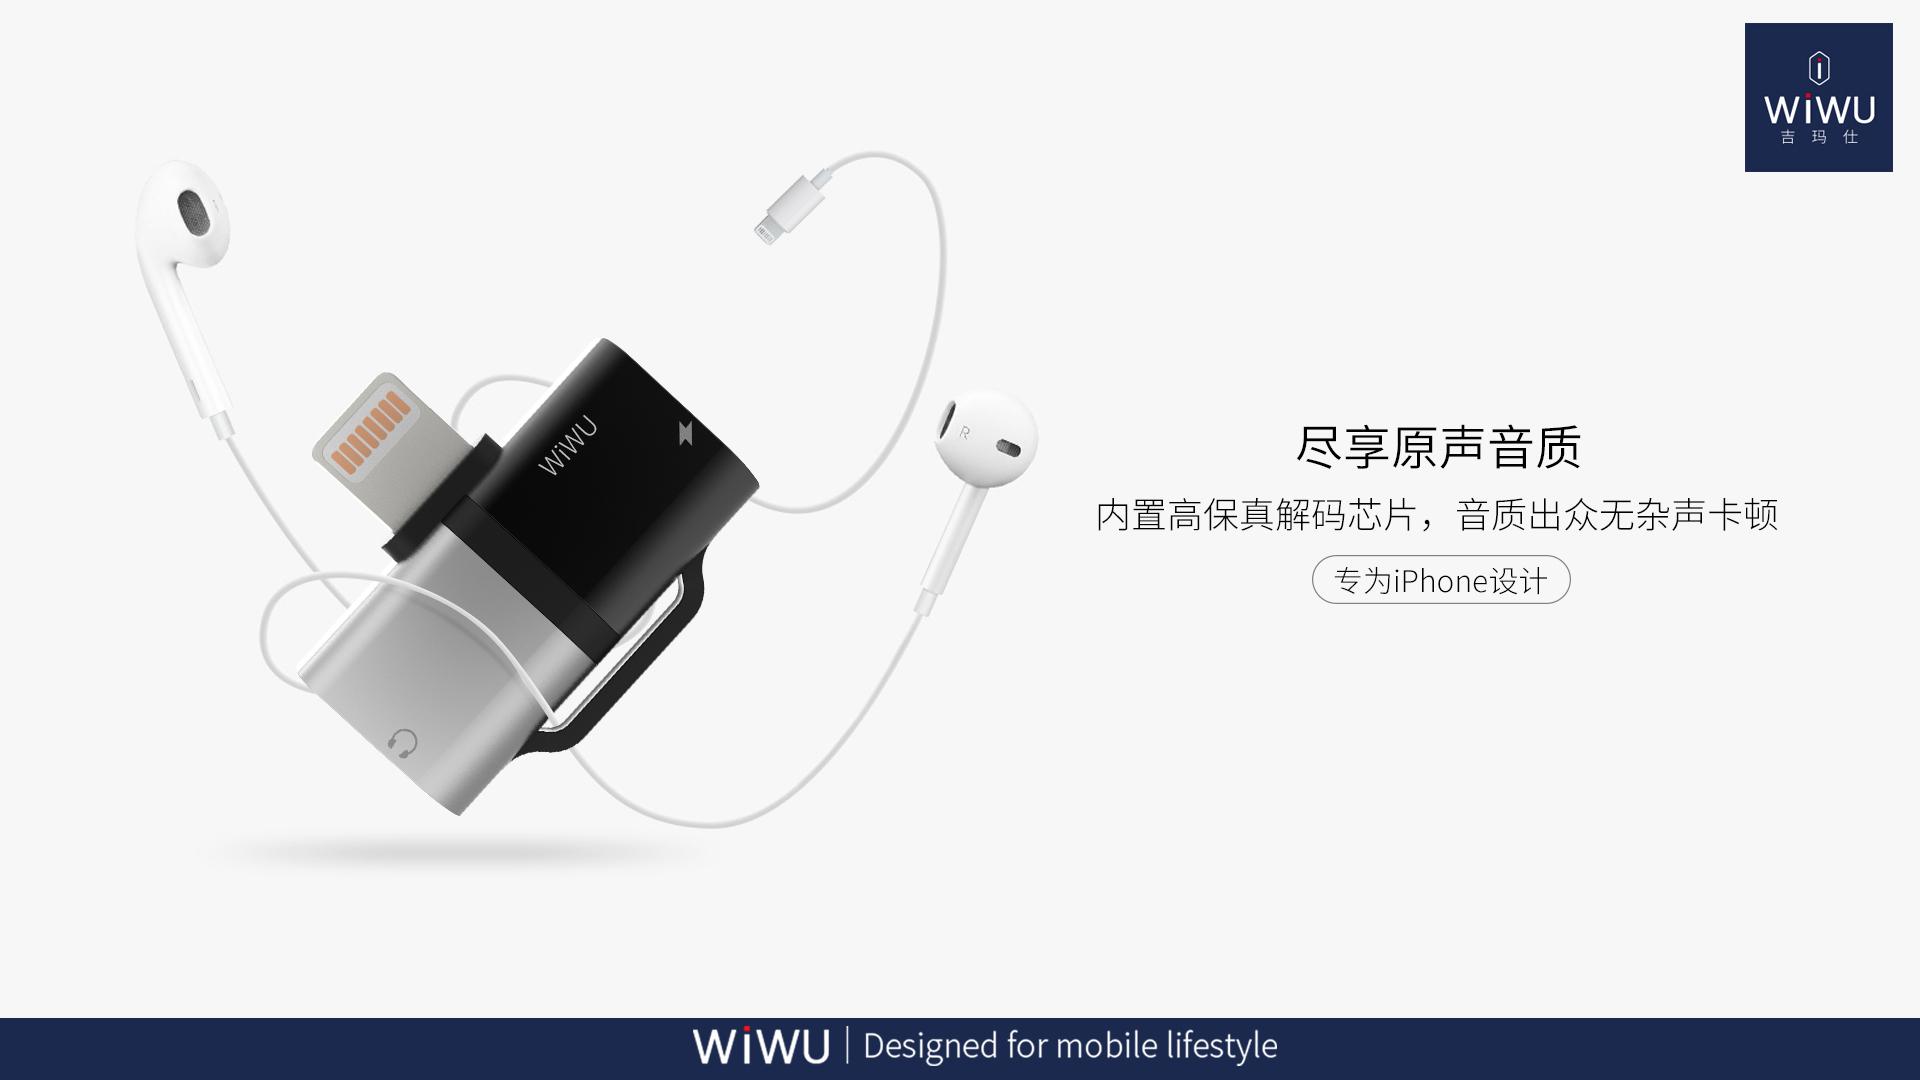 Wiwu Mini Dual Light-ning Convert for iphone audio adapter in retail box